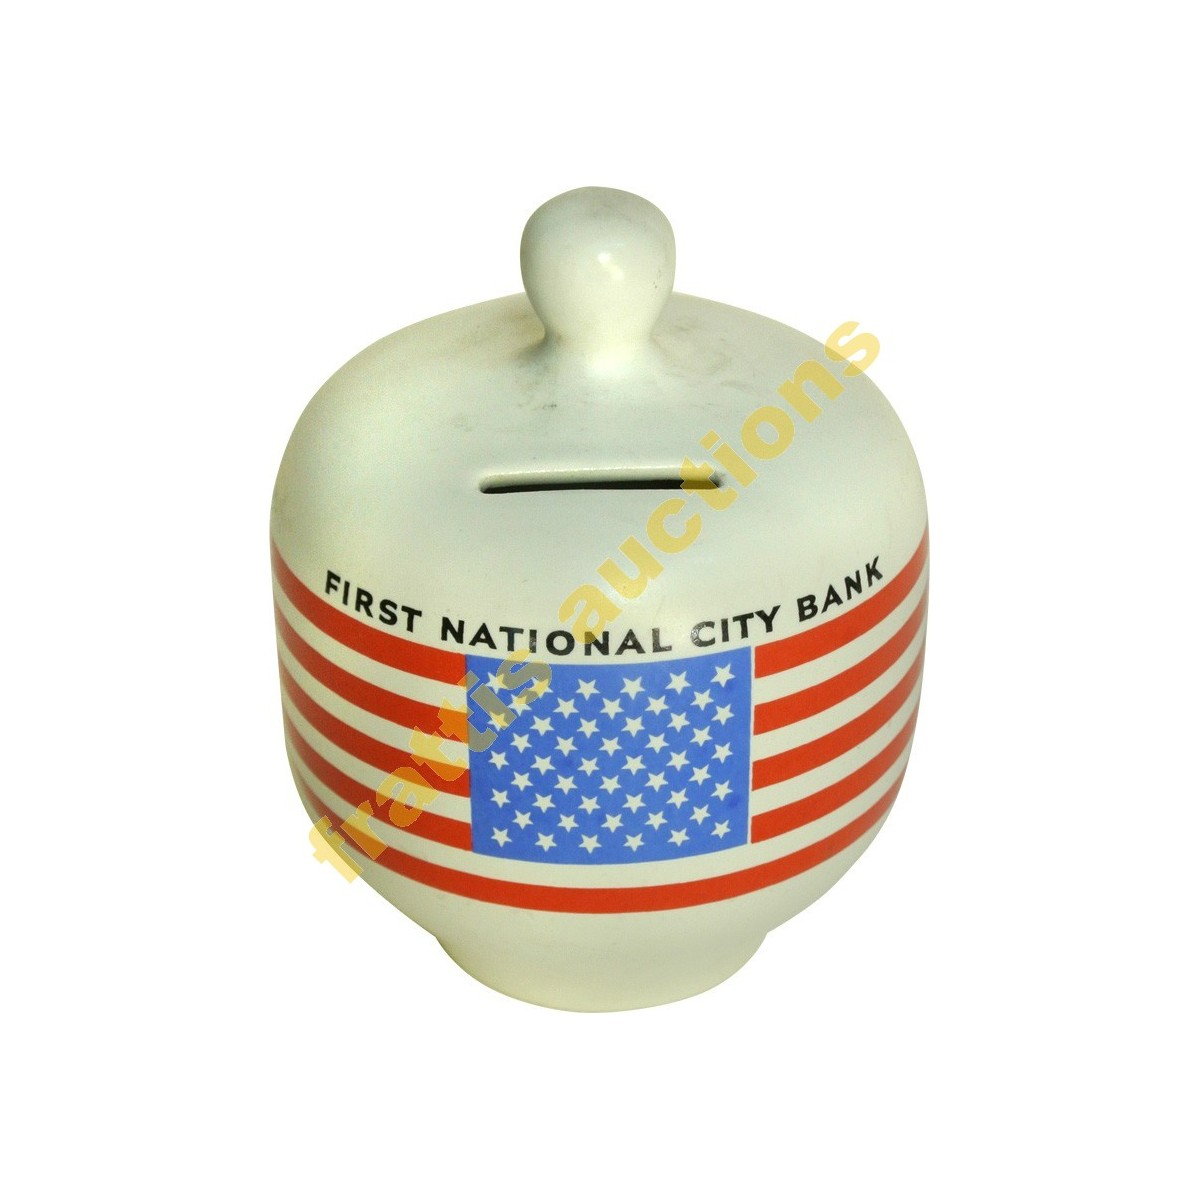 FIRST NATIONAL CITY BANK. Κεραμικός κουμπαράς